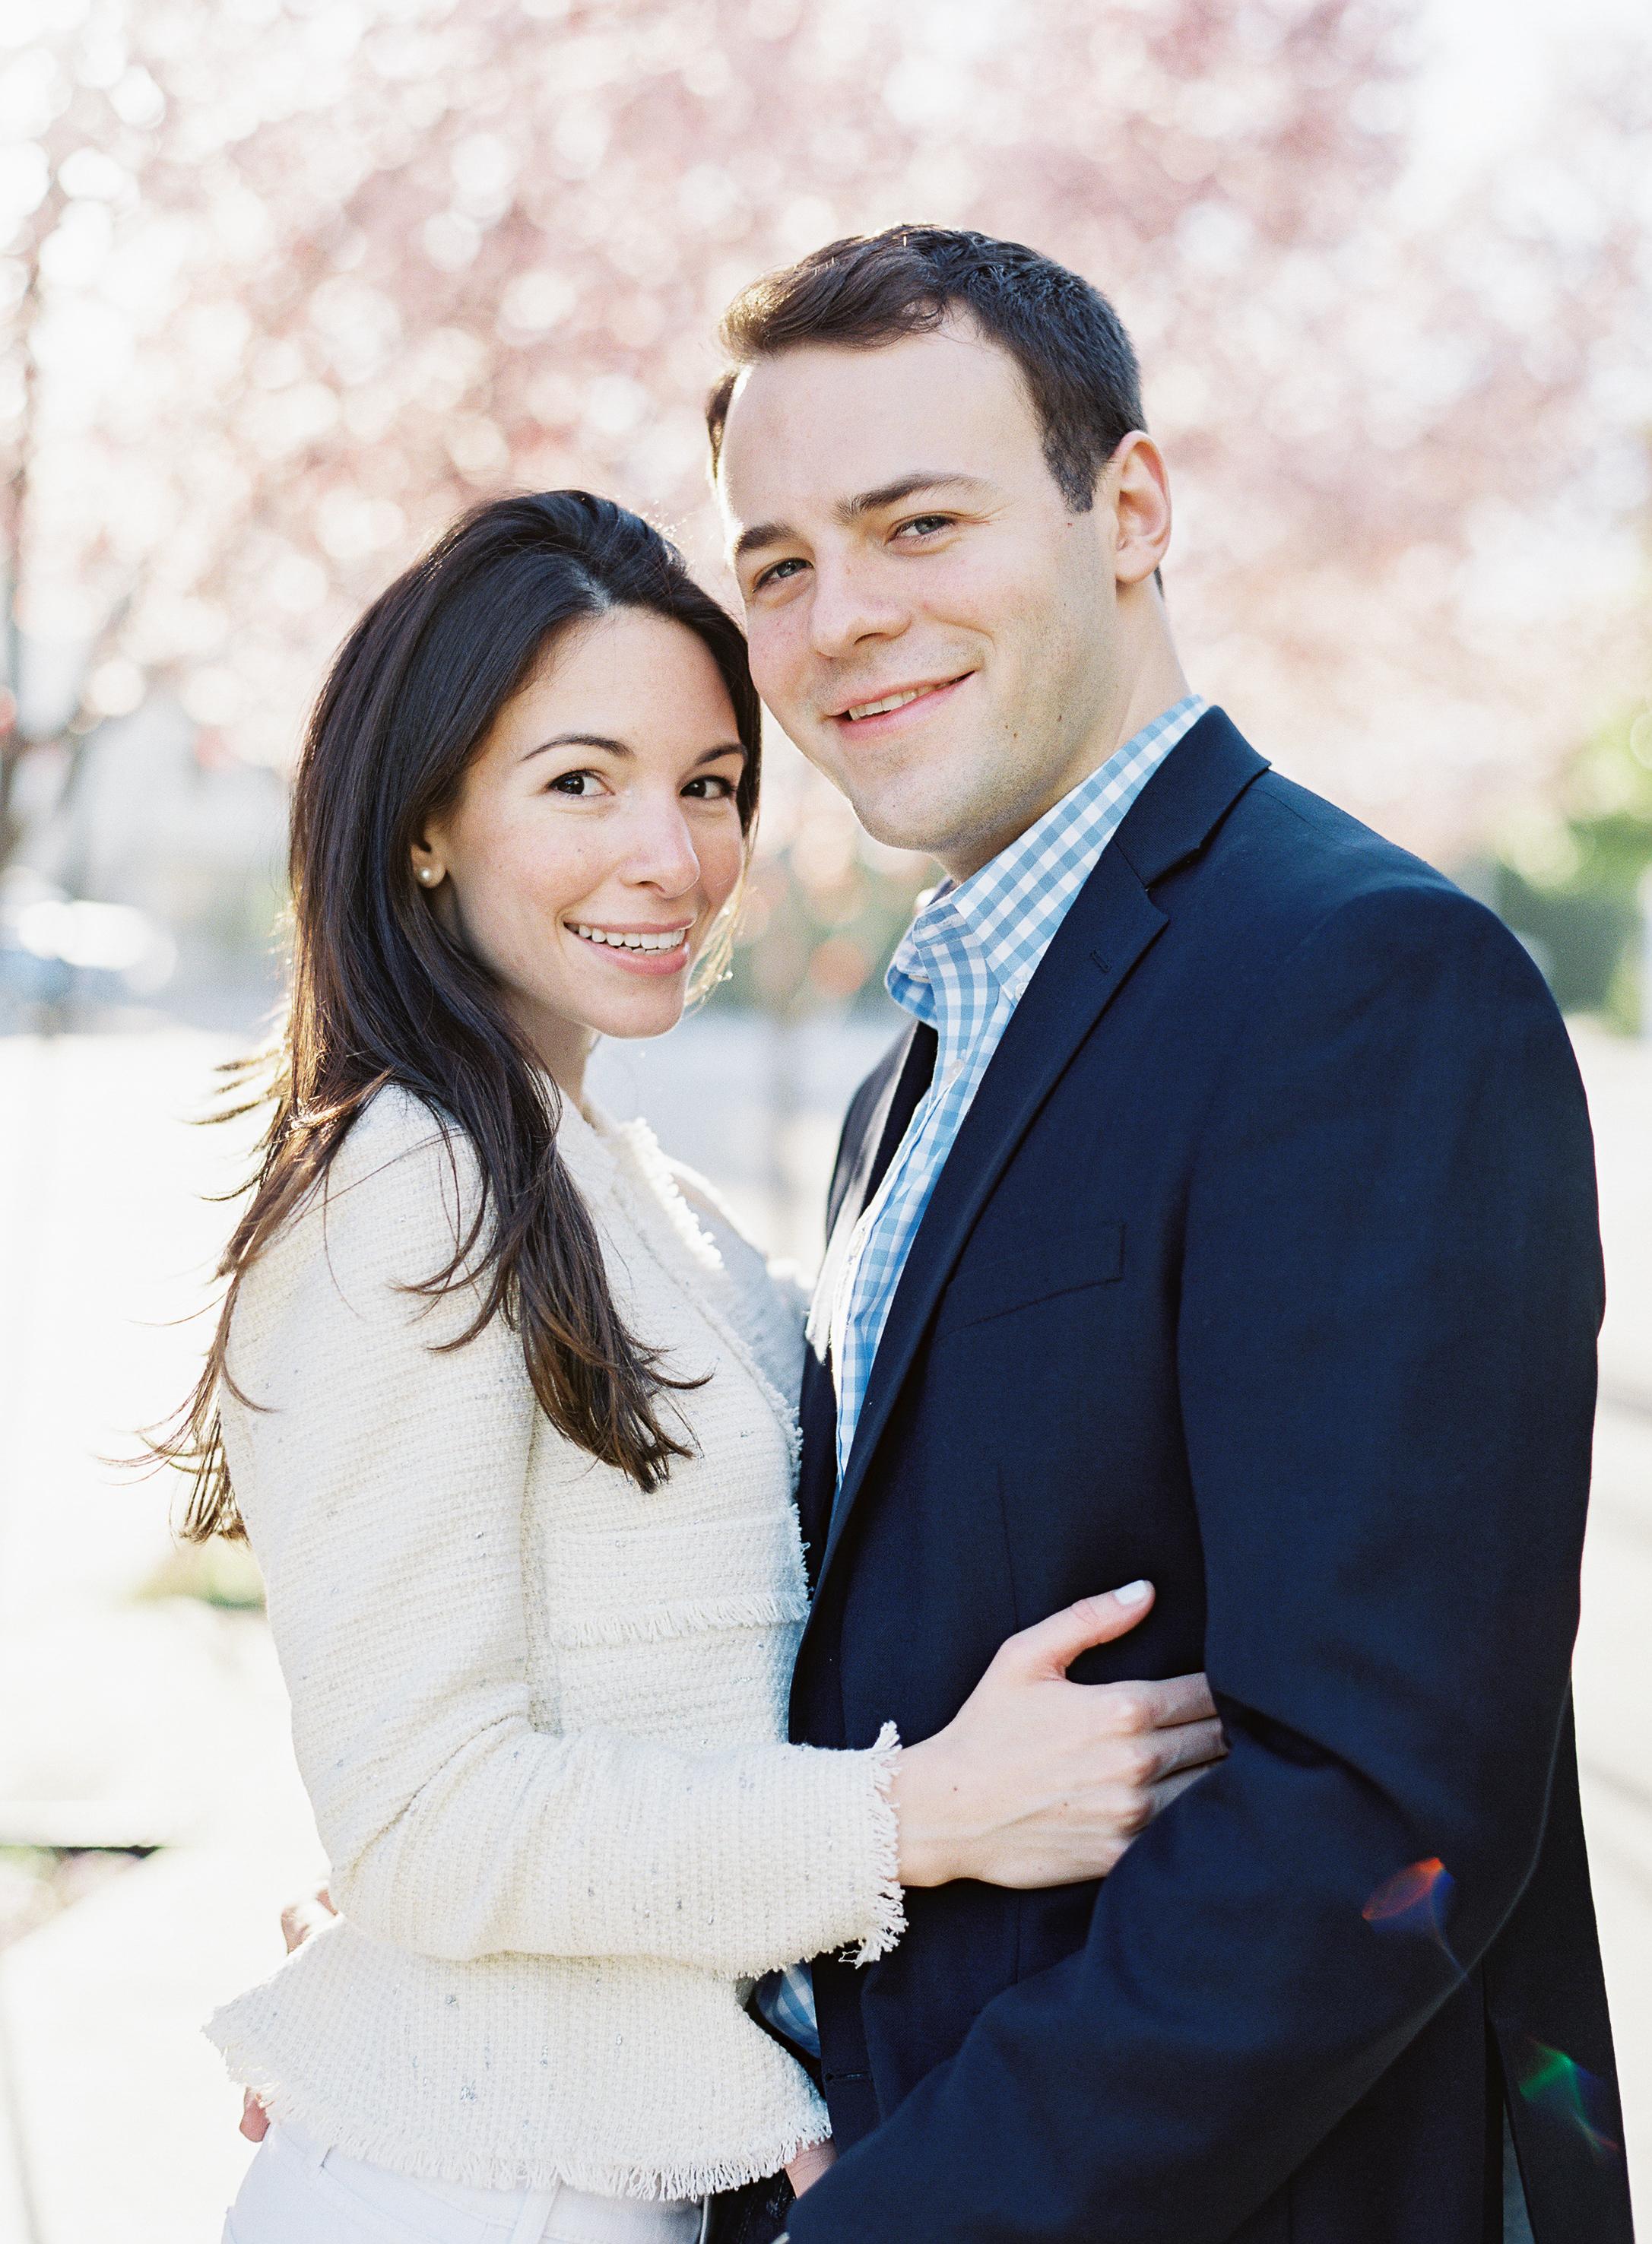 Meghan Mehan Photography - Fine Art Film Wedding Photography - San Francisco - Napa - Sonoma - Big Sur - Chicago - Minneapolis - Milwaukee - Lake Geneva - Door County - Wisconsin007.jpg